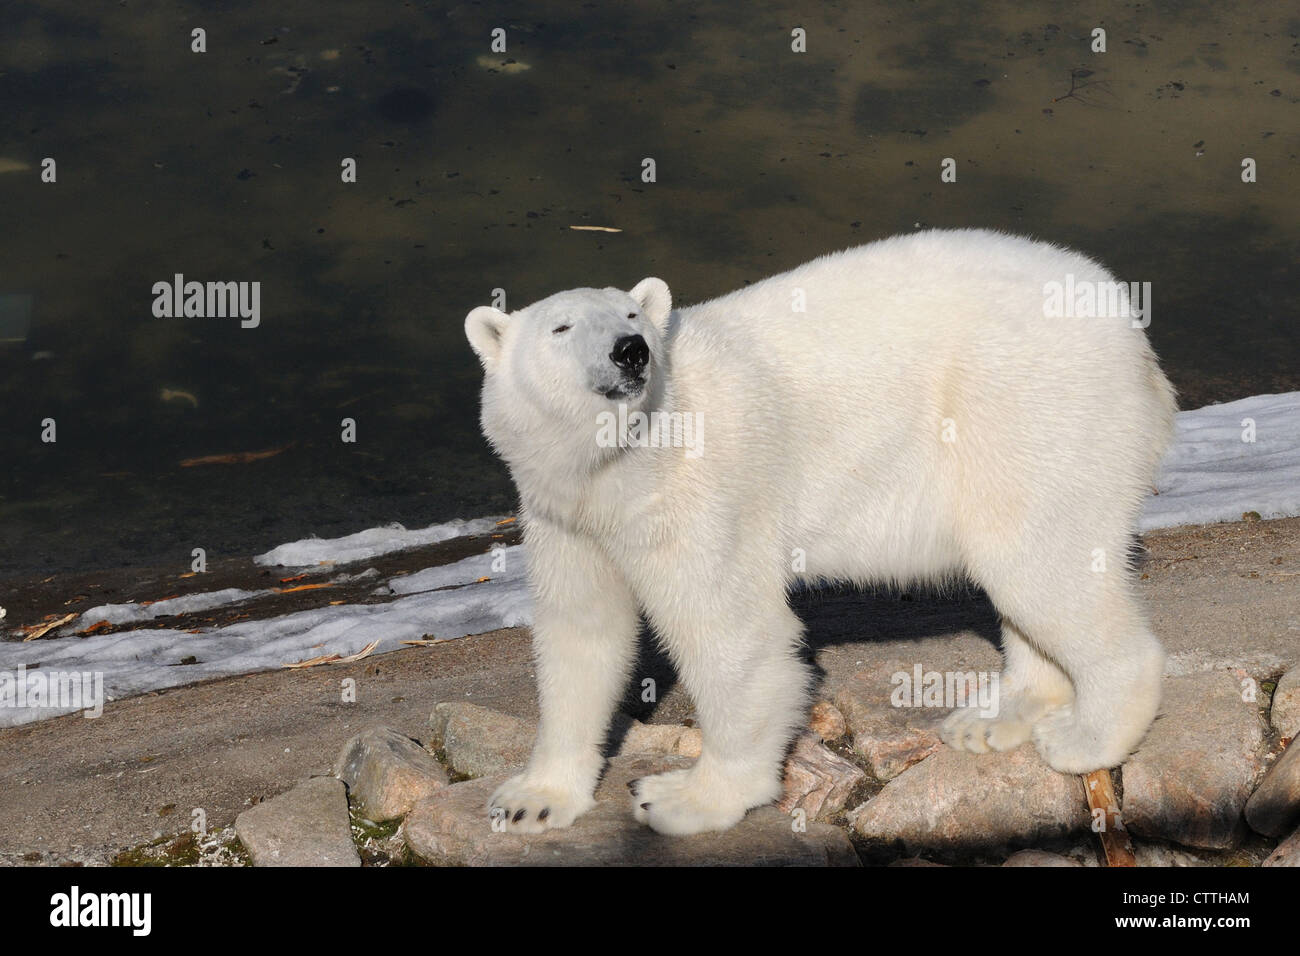 Polar Bear, Ursus maritimus, Artic Circle, Finland, Europe - Stock Image